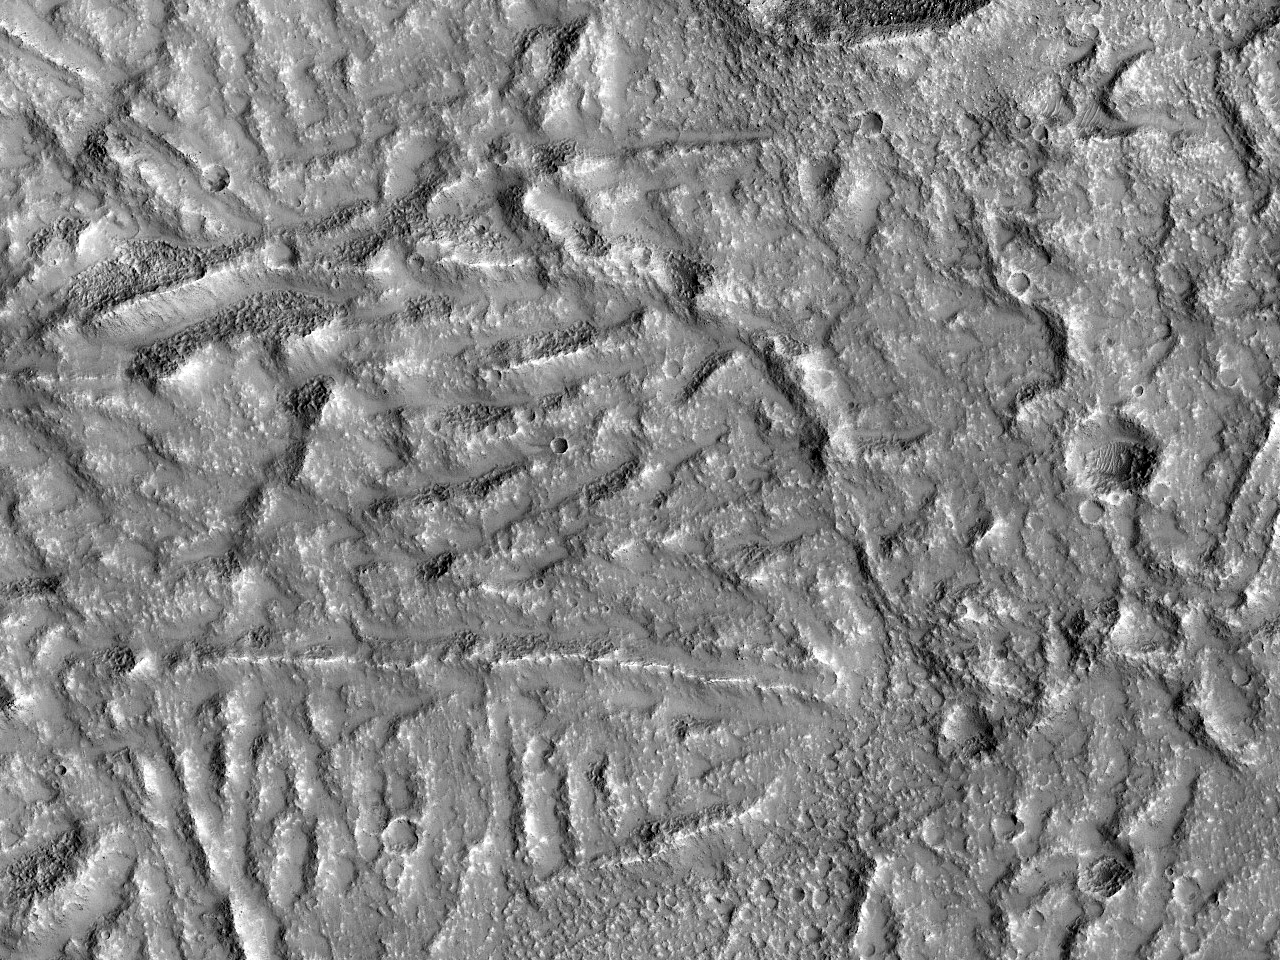 Pământ cu lava antica (Terra Sirenum)